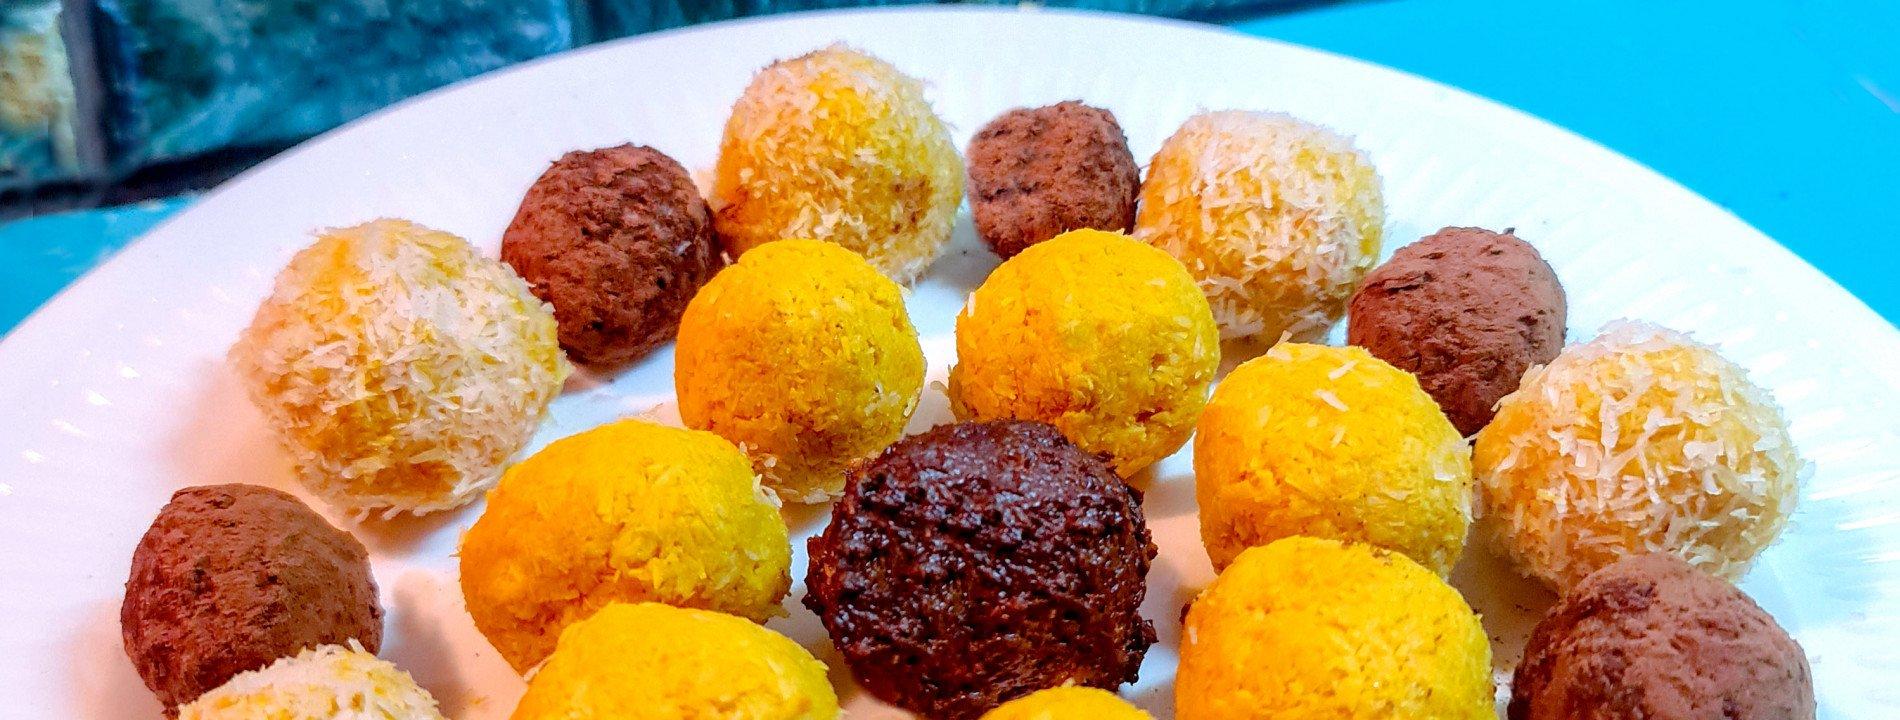 Sweet Potato and Cocoa Truffles